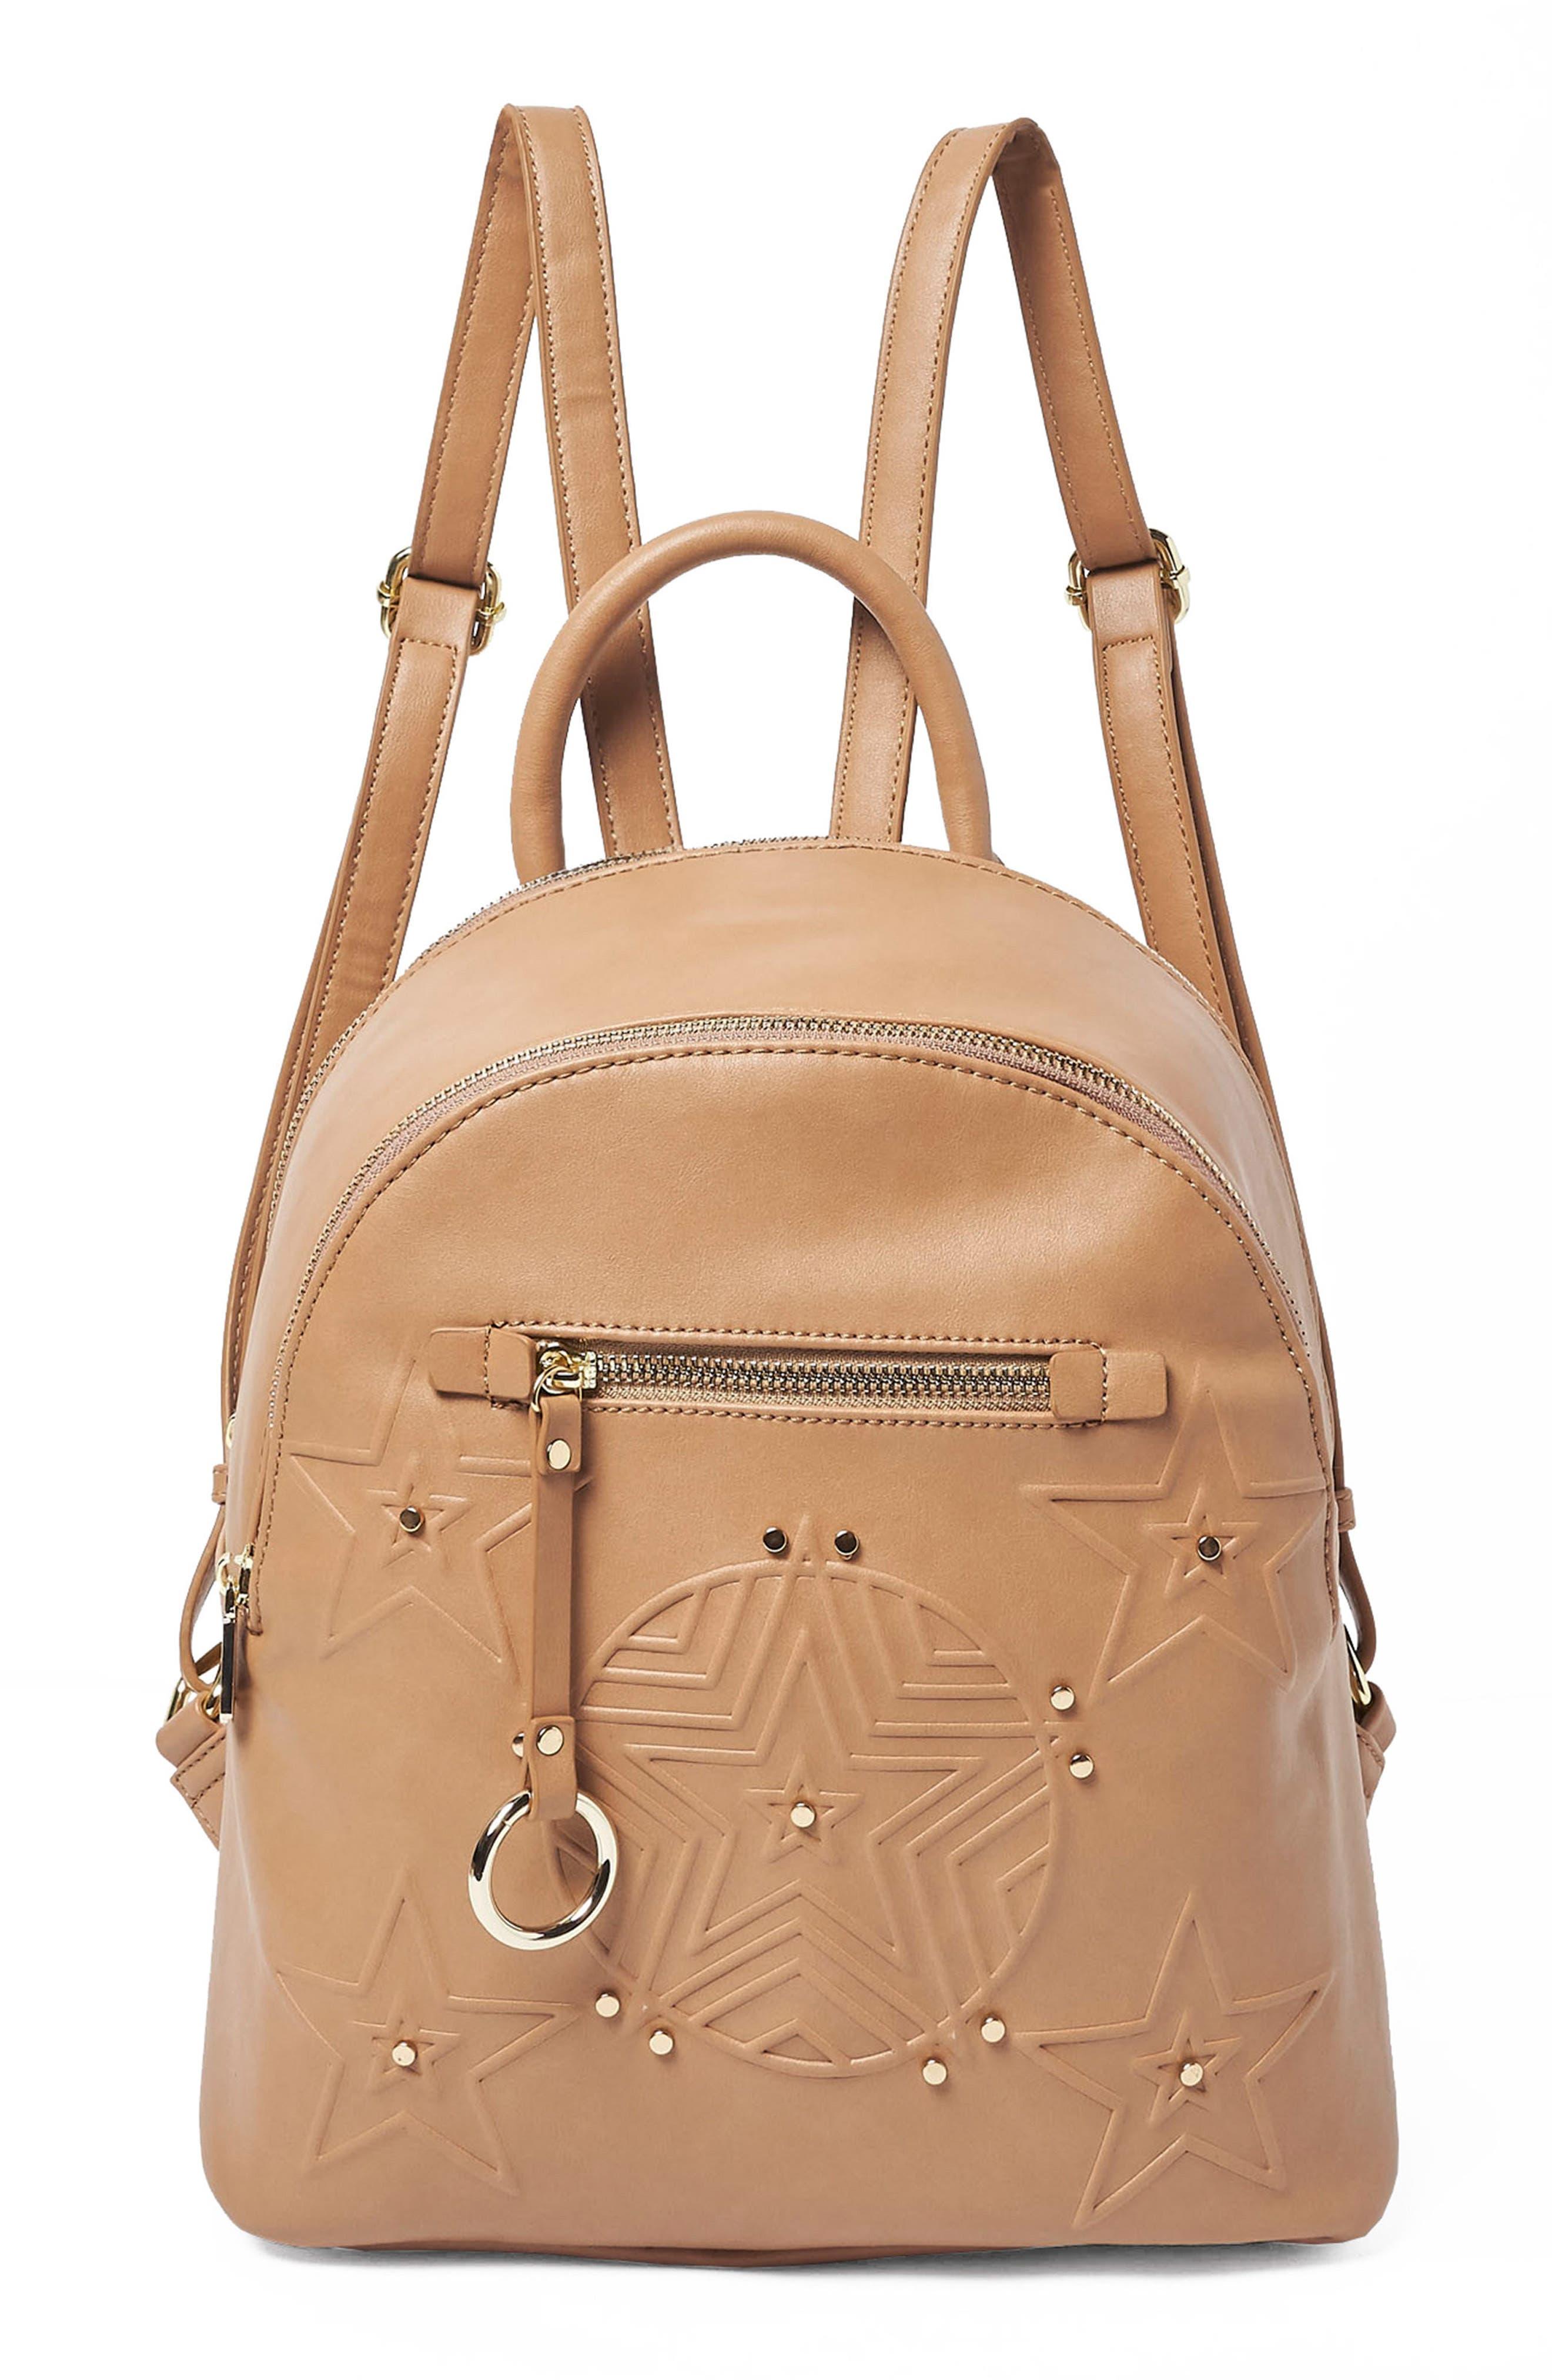 Urban Originals Celestial Vegan Leather Backpack